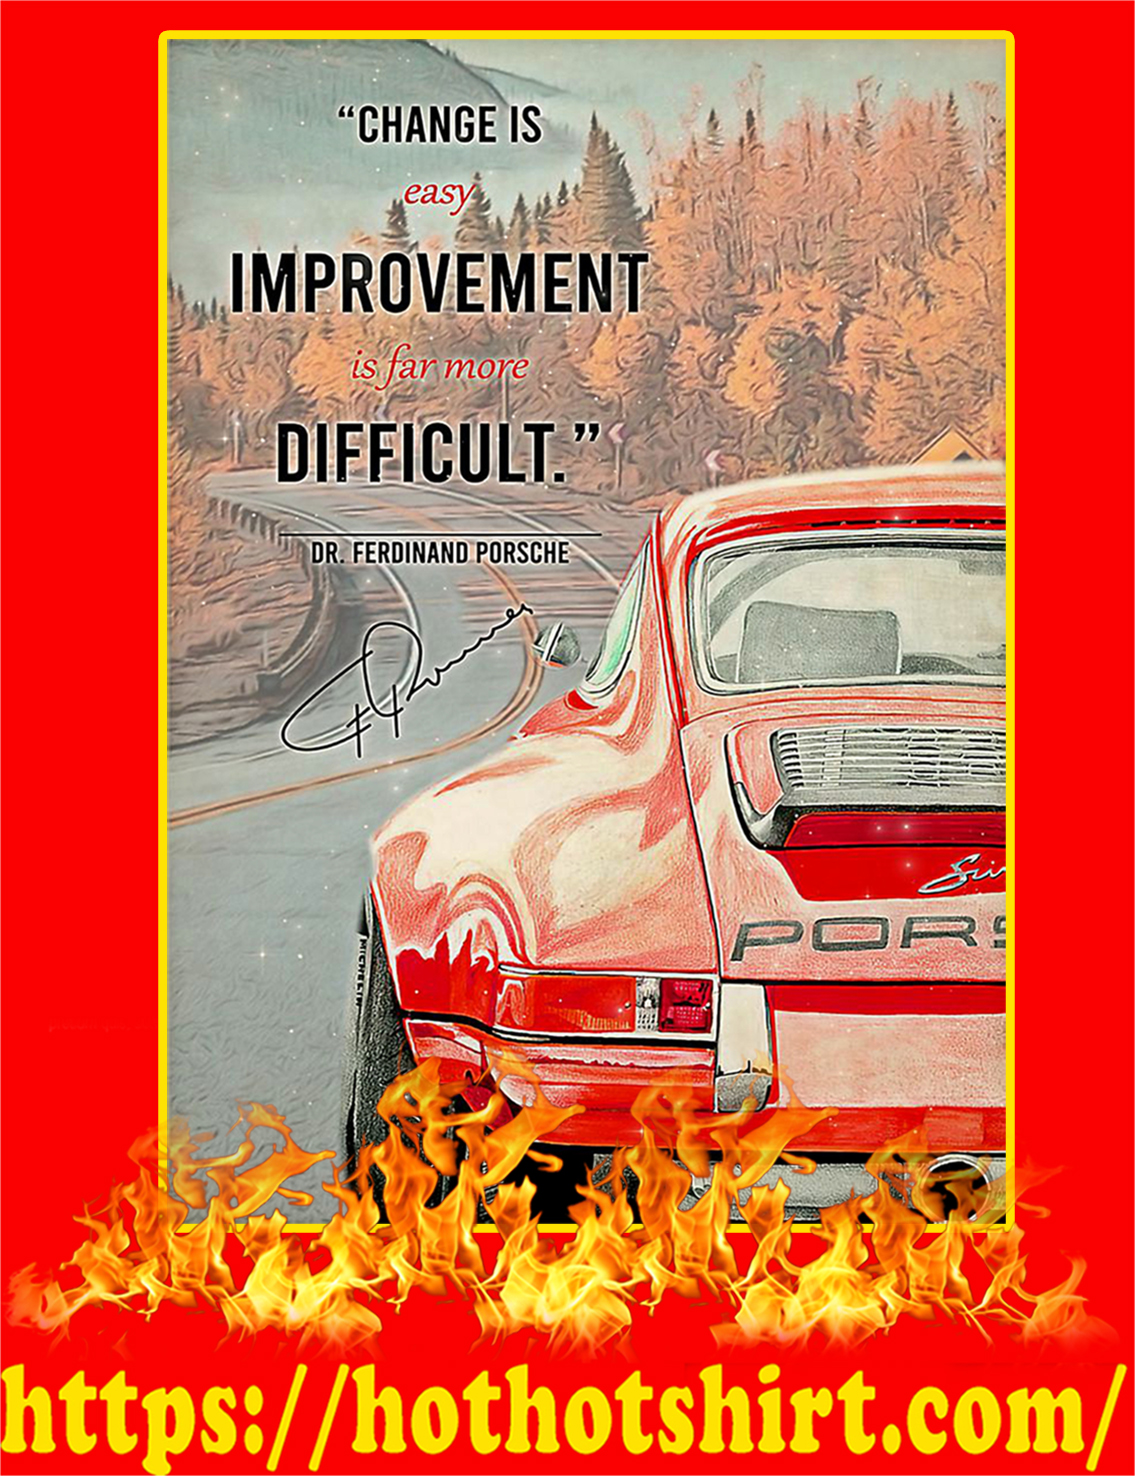 Change Is Easy Improvement Is Far More Difficult Dr Ferdinand Porsche Signature Poster - A1